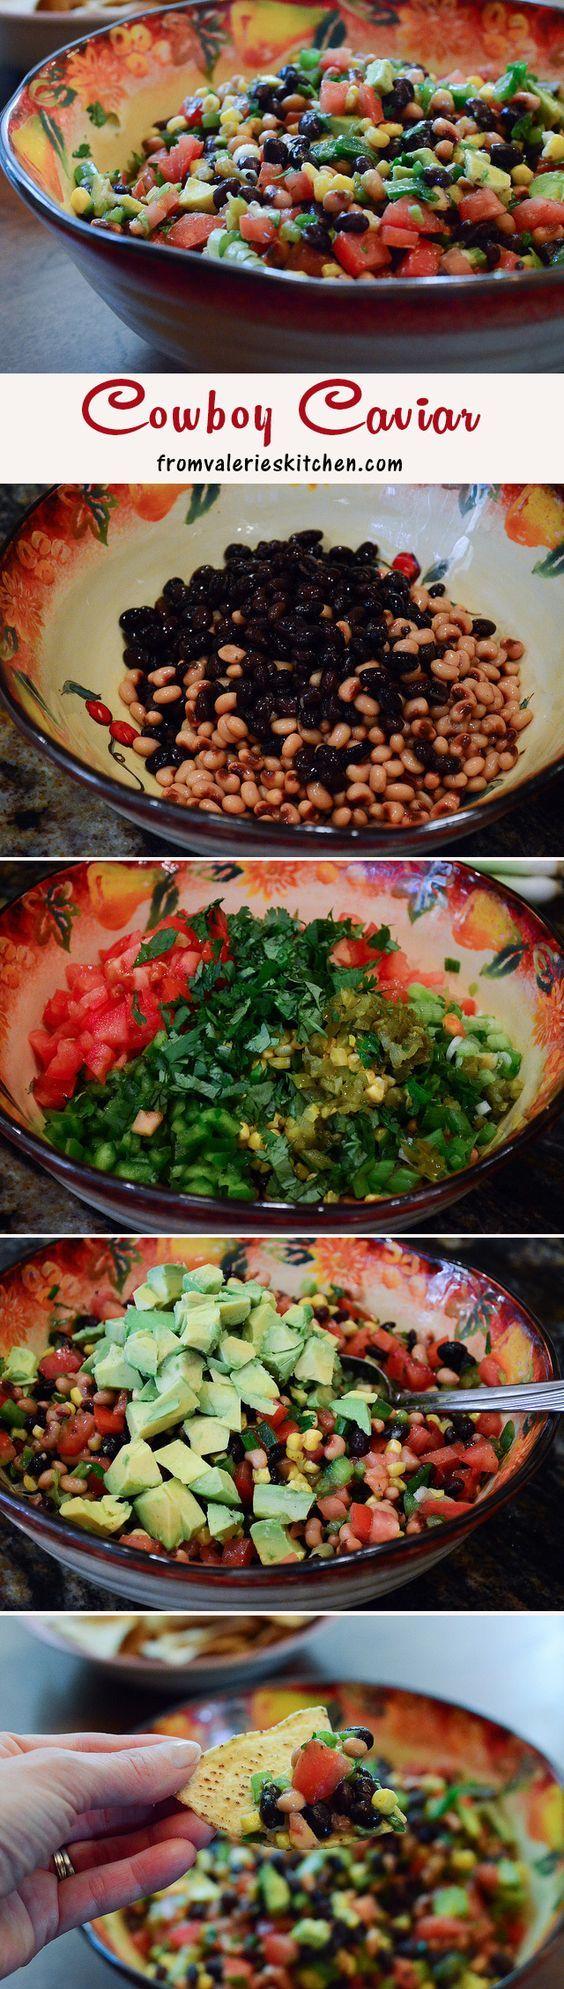 Cowboy Caviar - a fresh, healthy, DELICIOUS appetizer